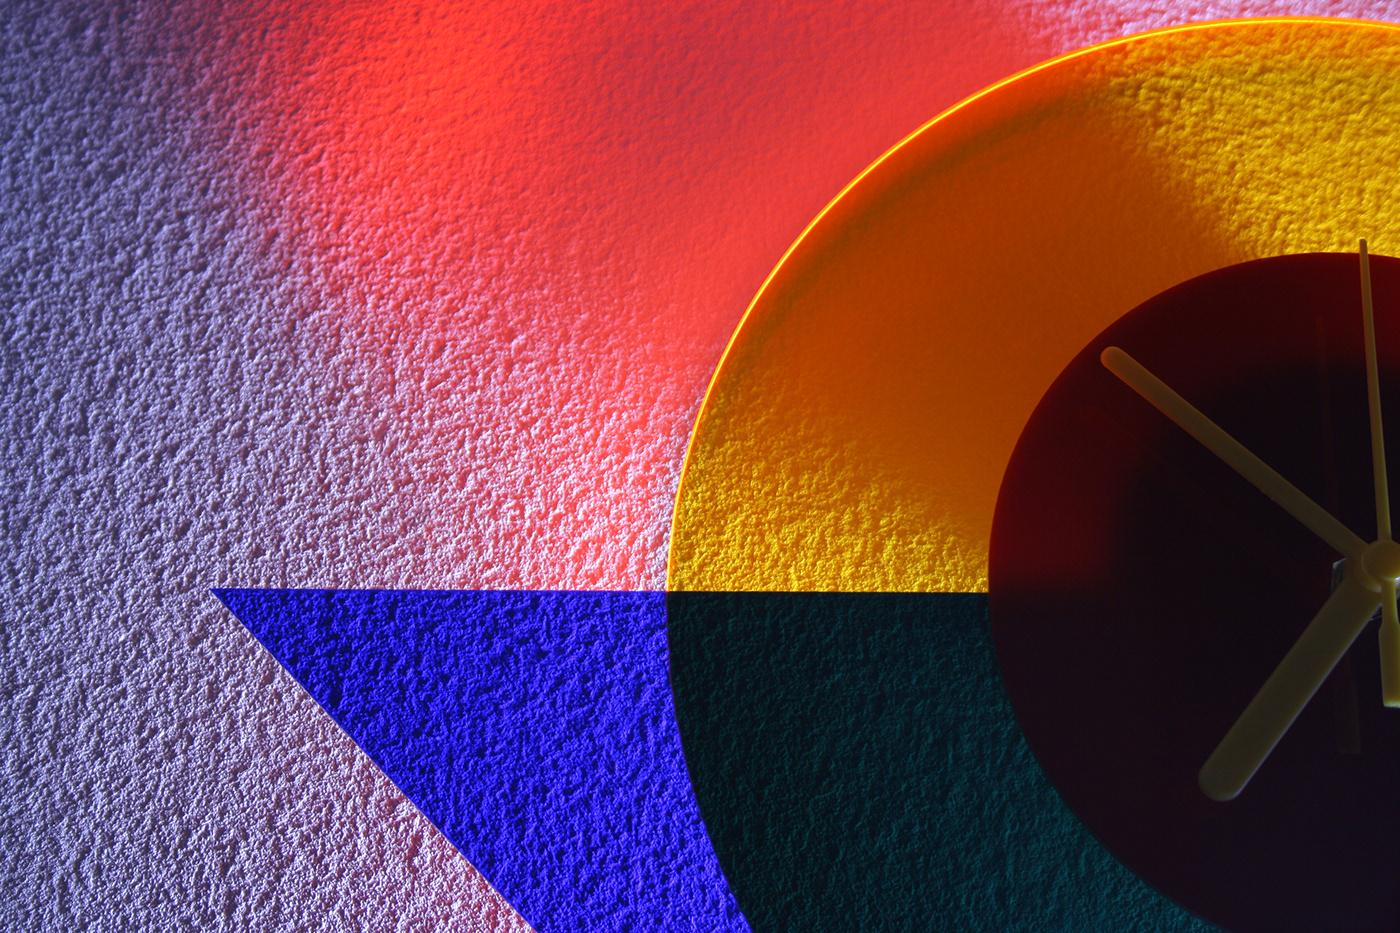 Image may contain: abstract, colorfulness and circle